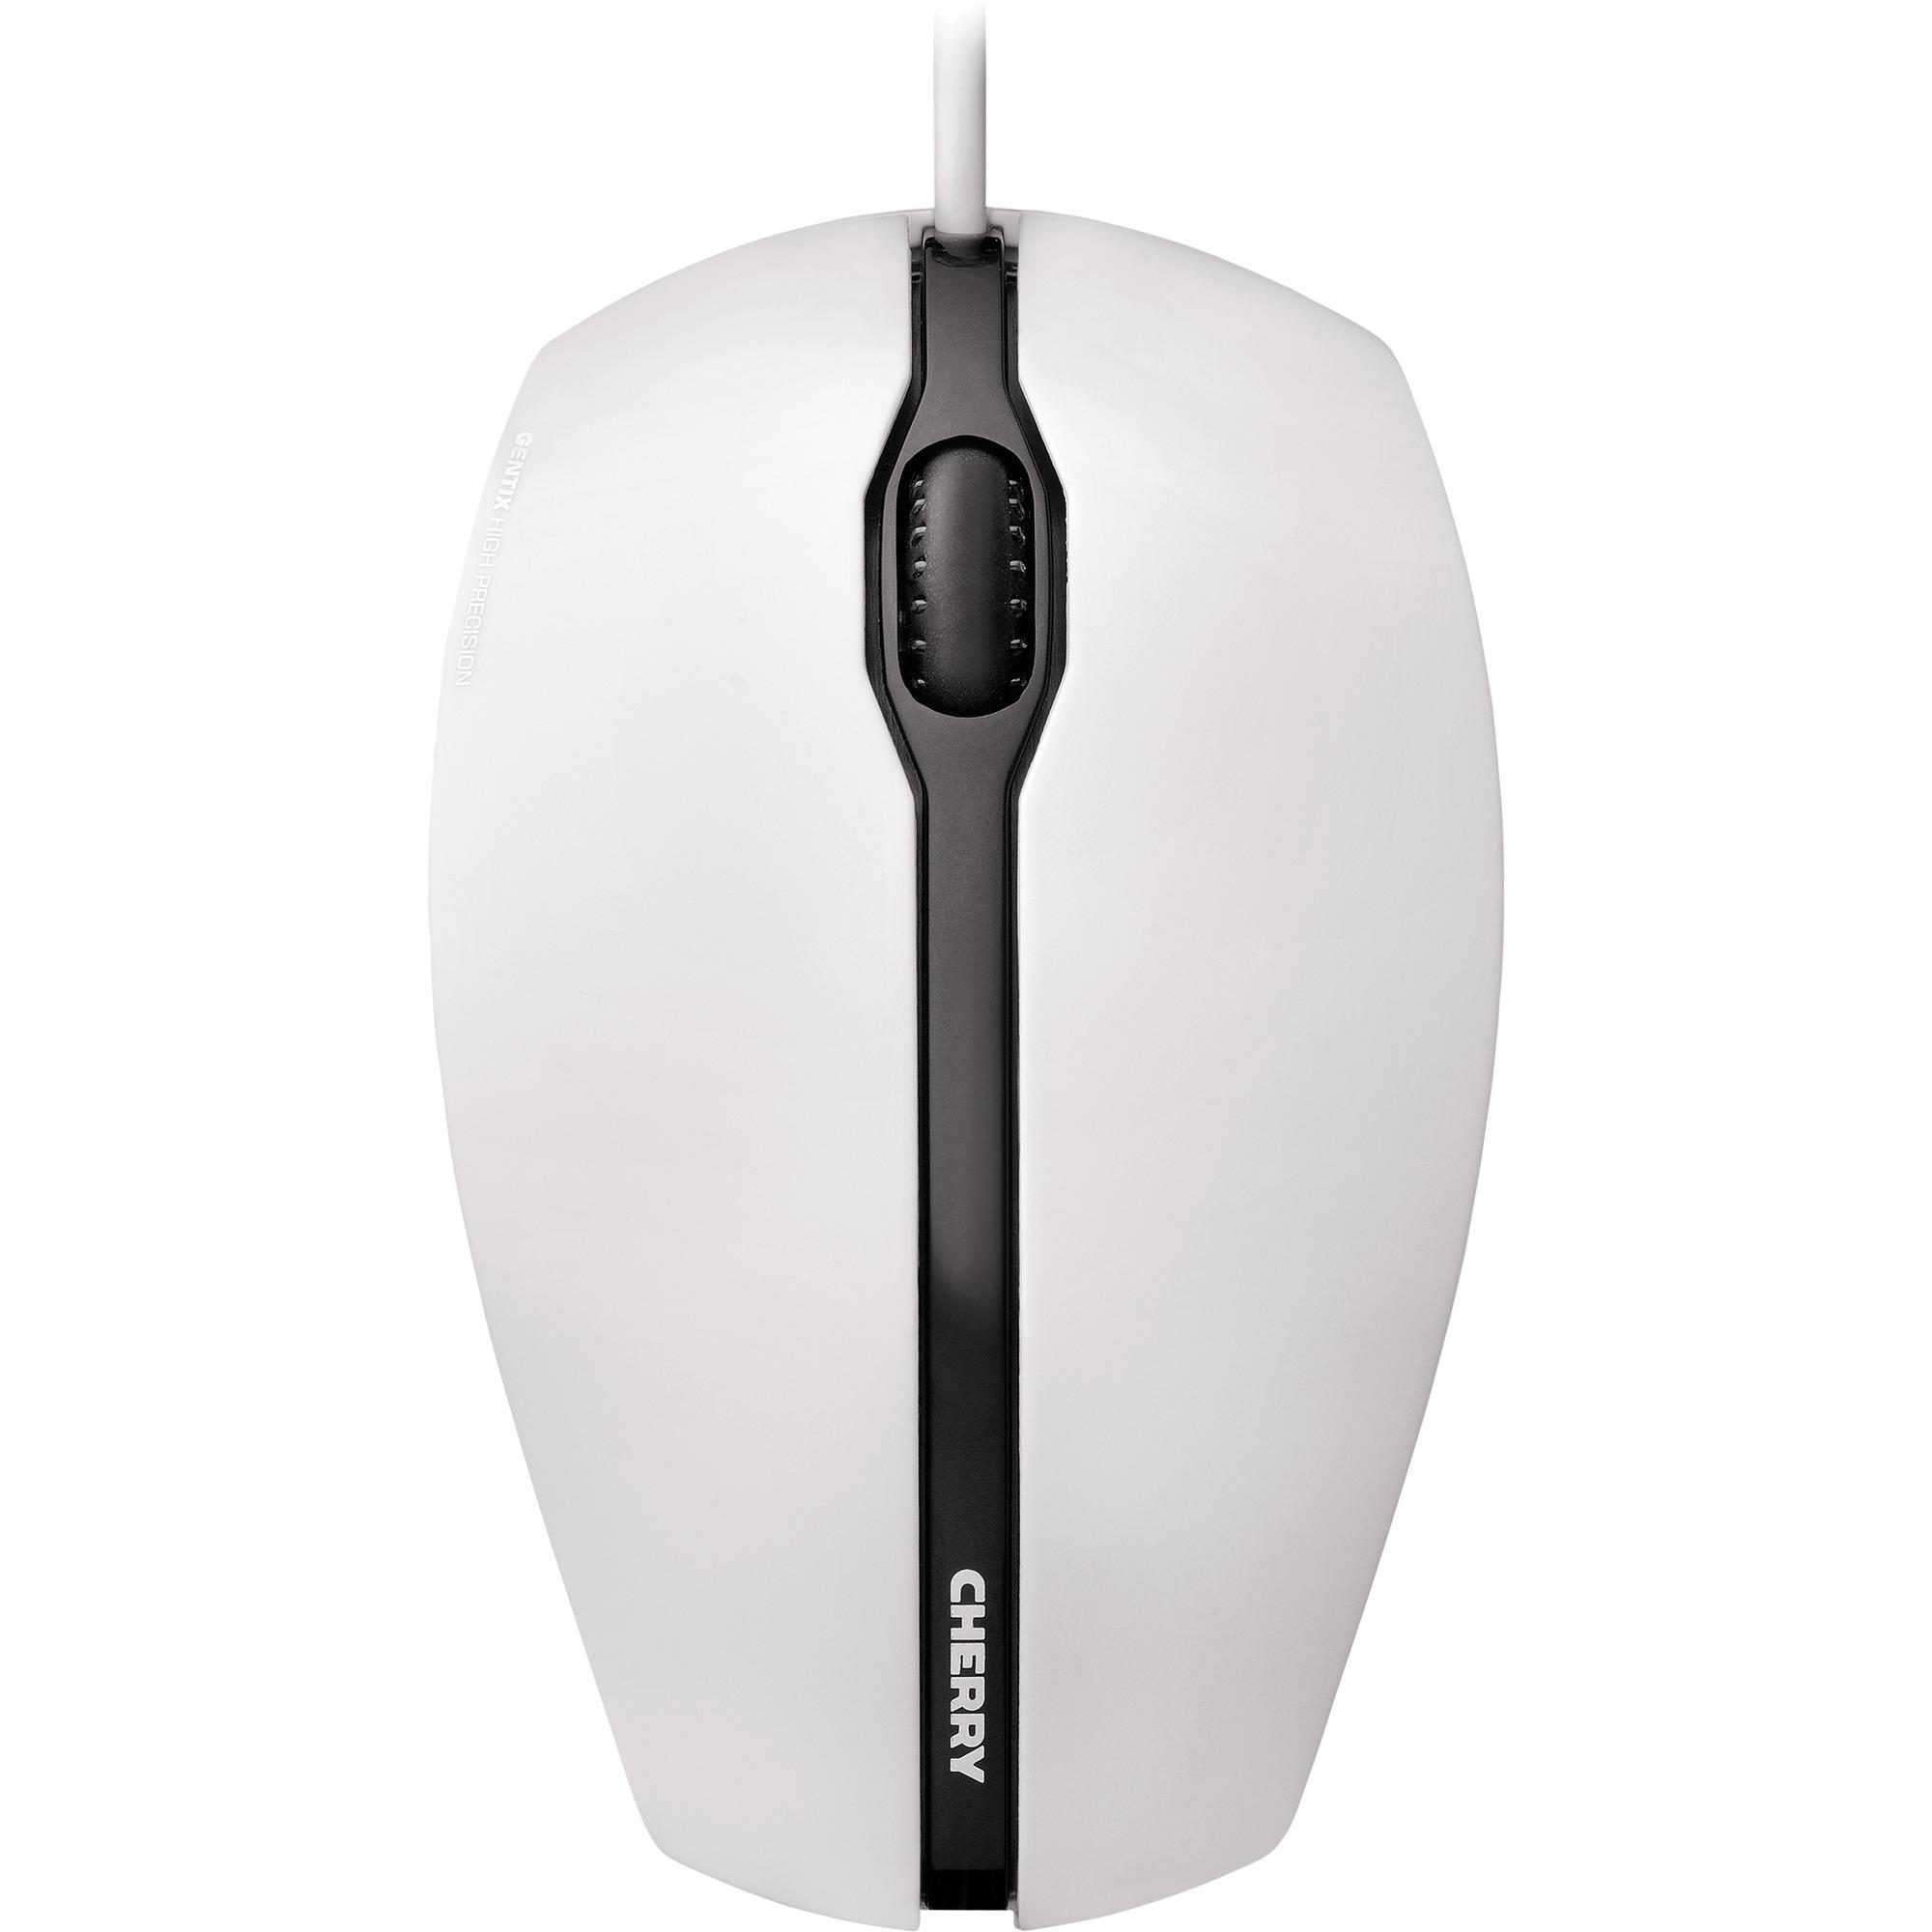 GENTIX USB Óptico 1000DPI Ambidextro Negro, Gris ratón